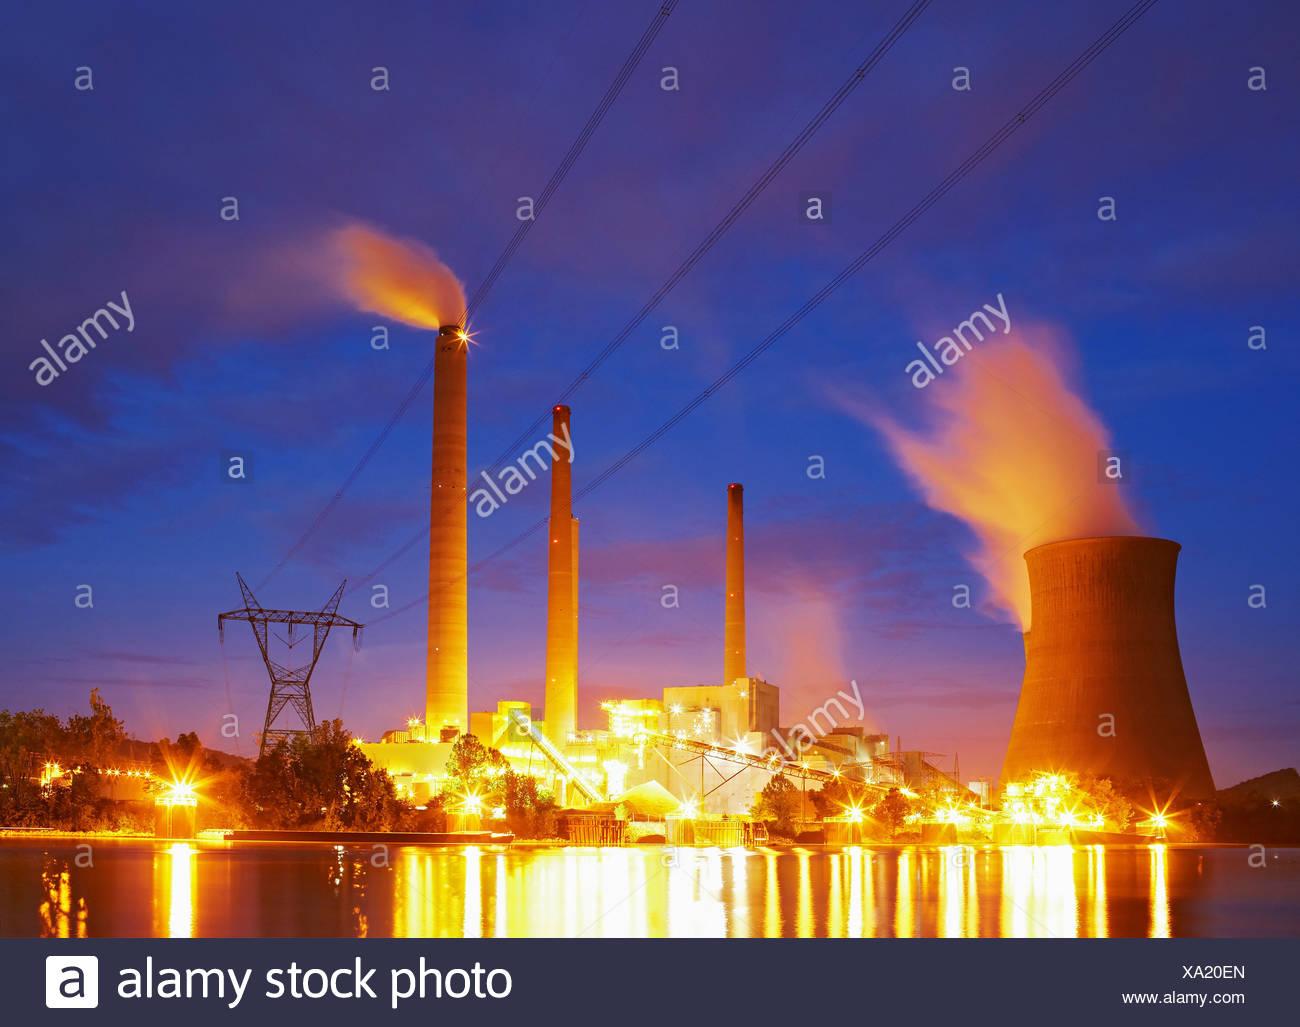 John E. Amos Power Plant and Kanawha River at Dusk - Stock Image